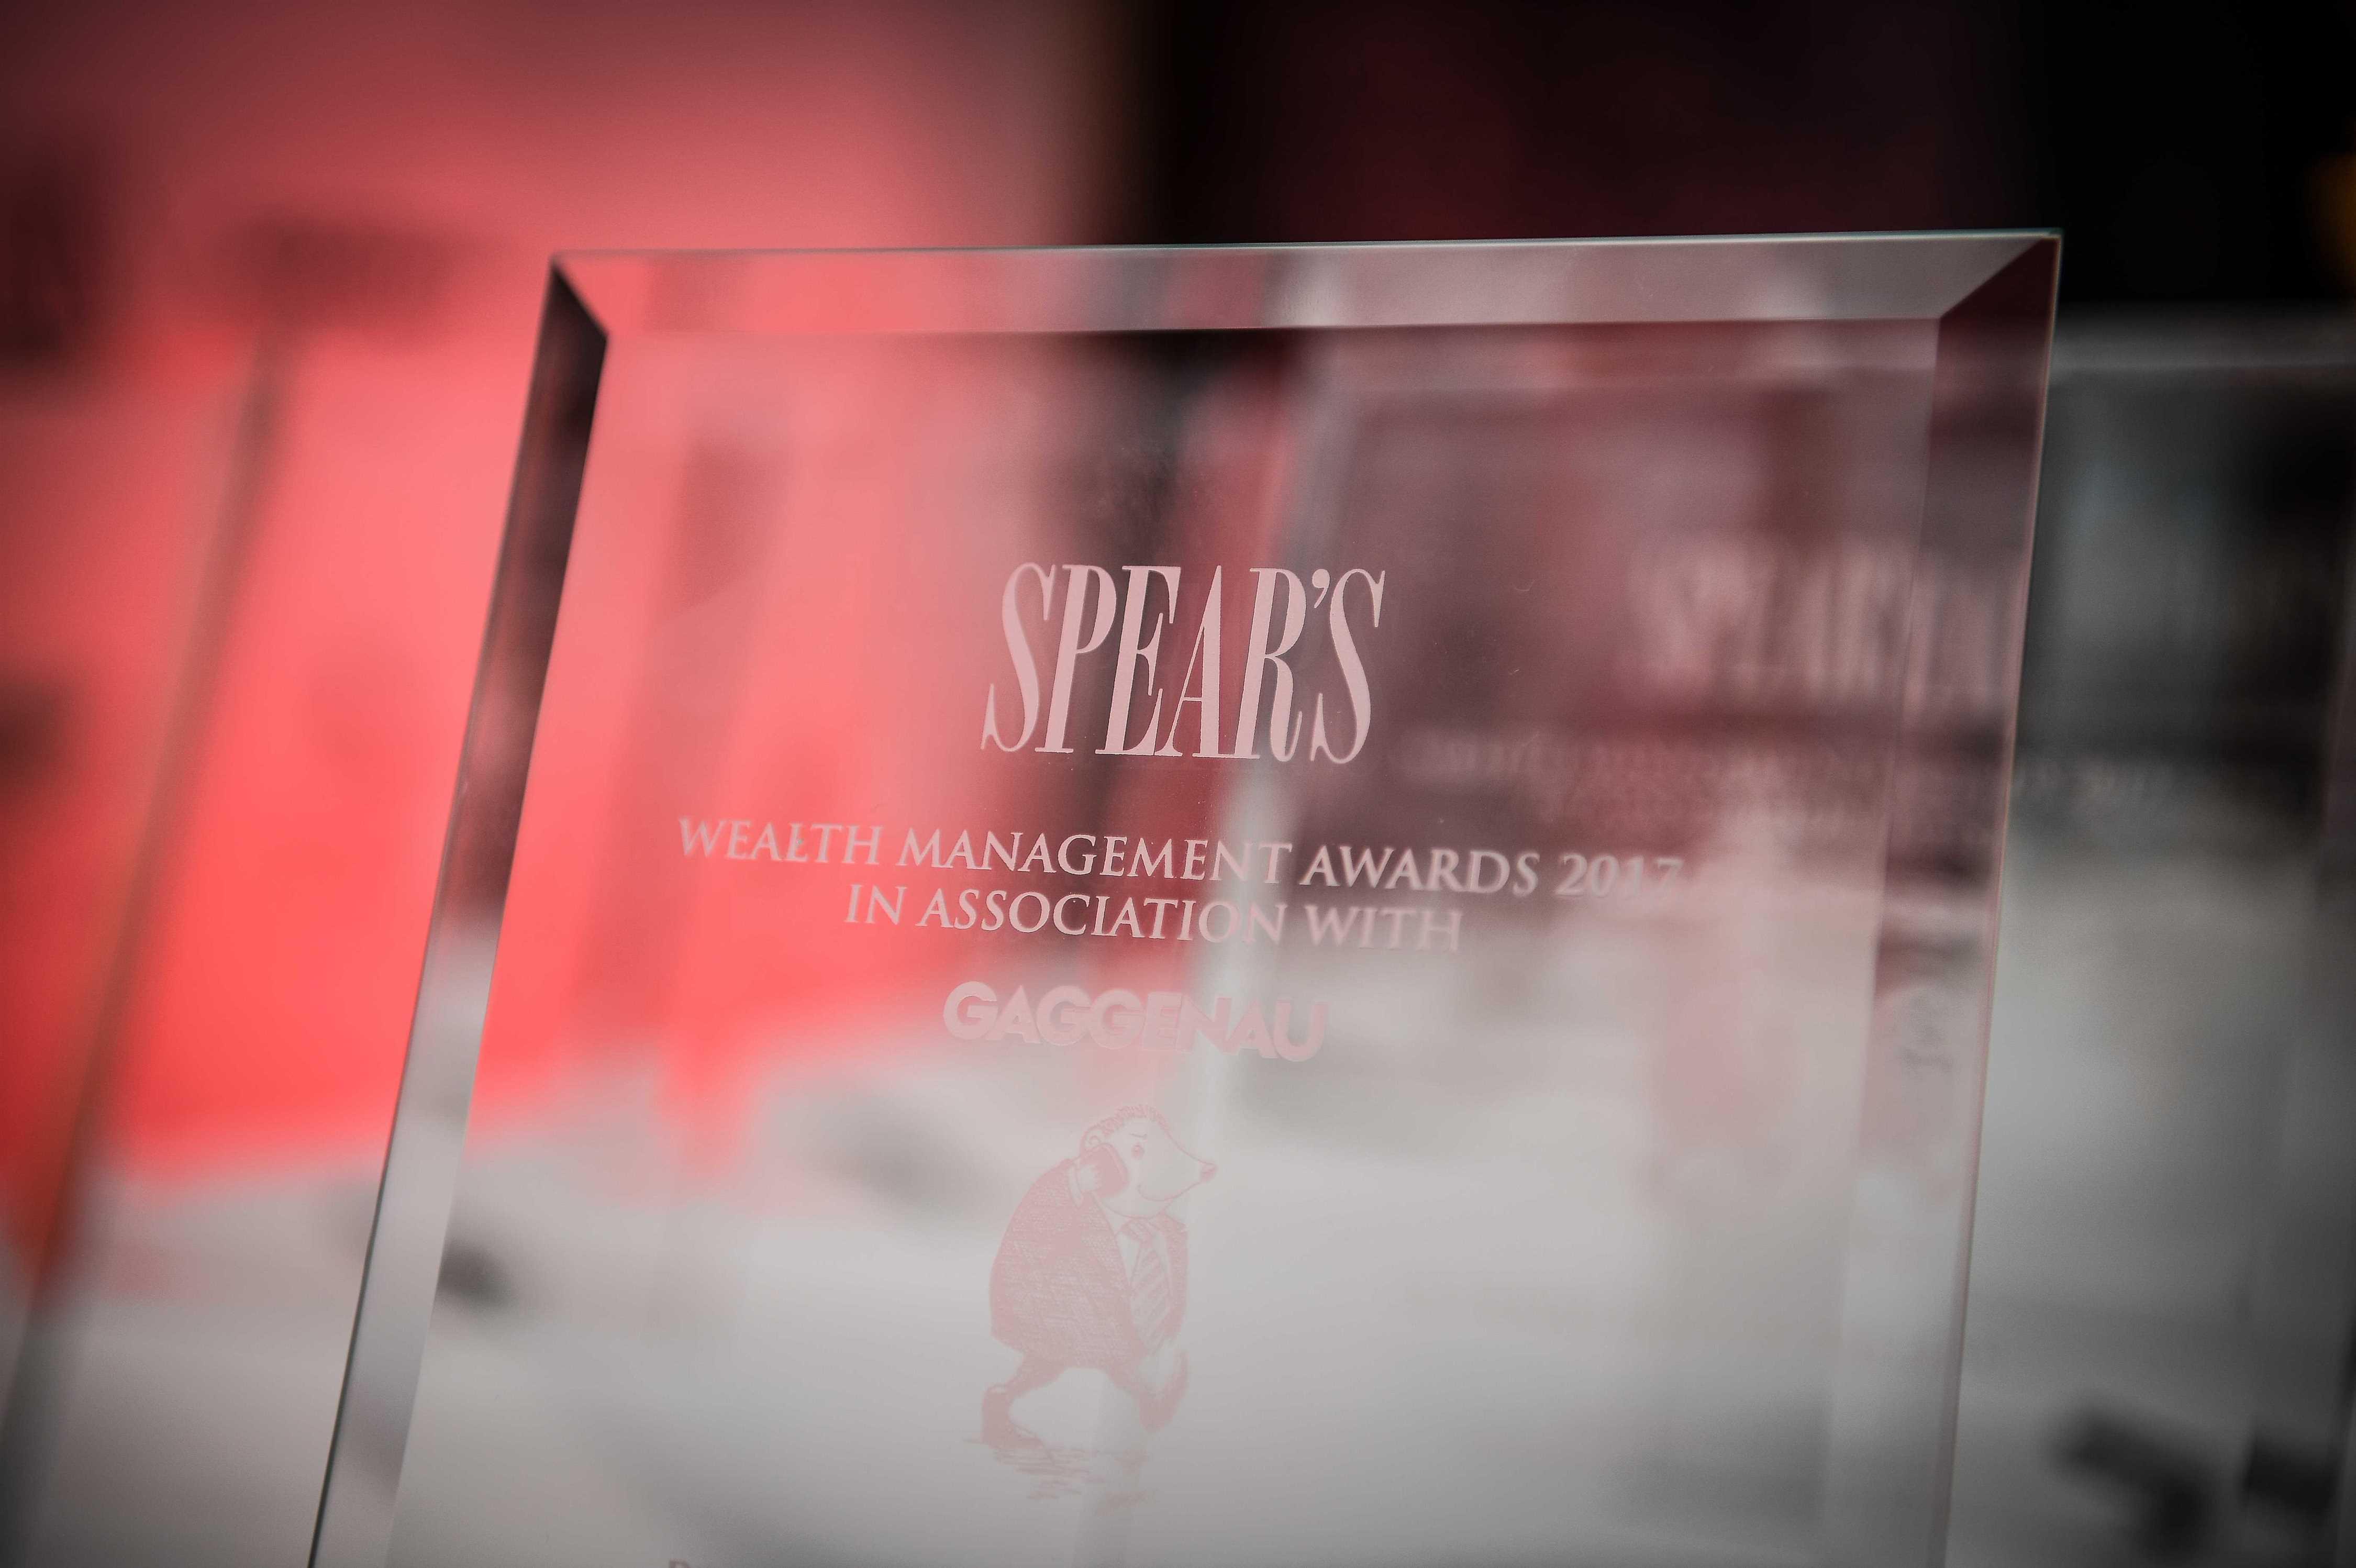 Spear's Wealth Management Awards award